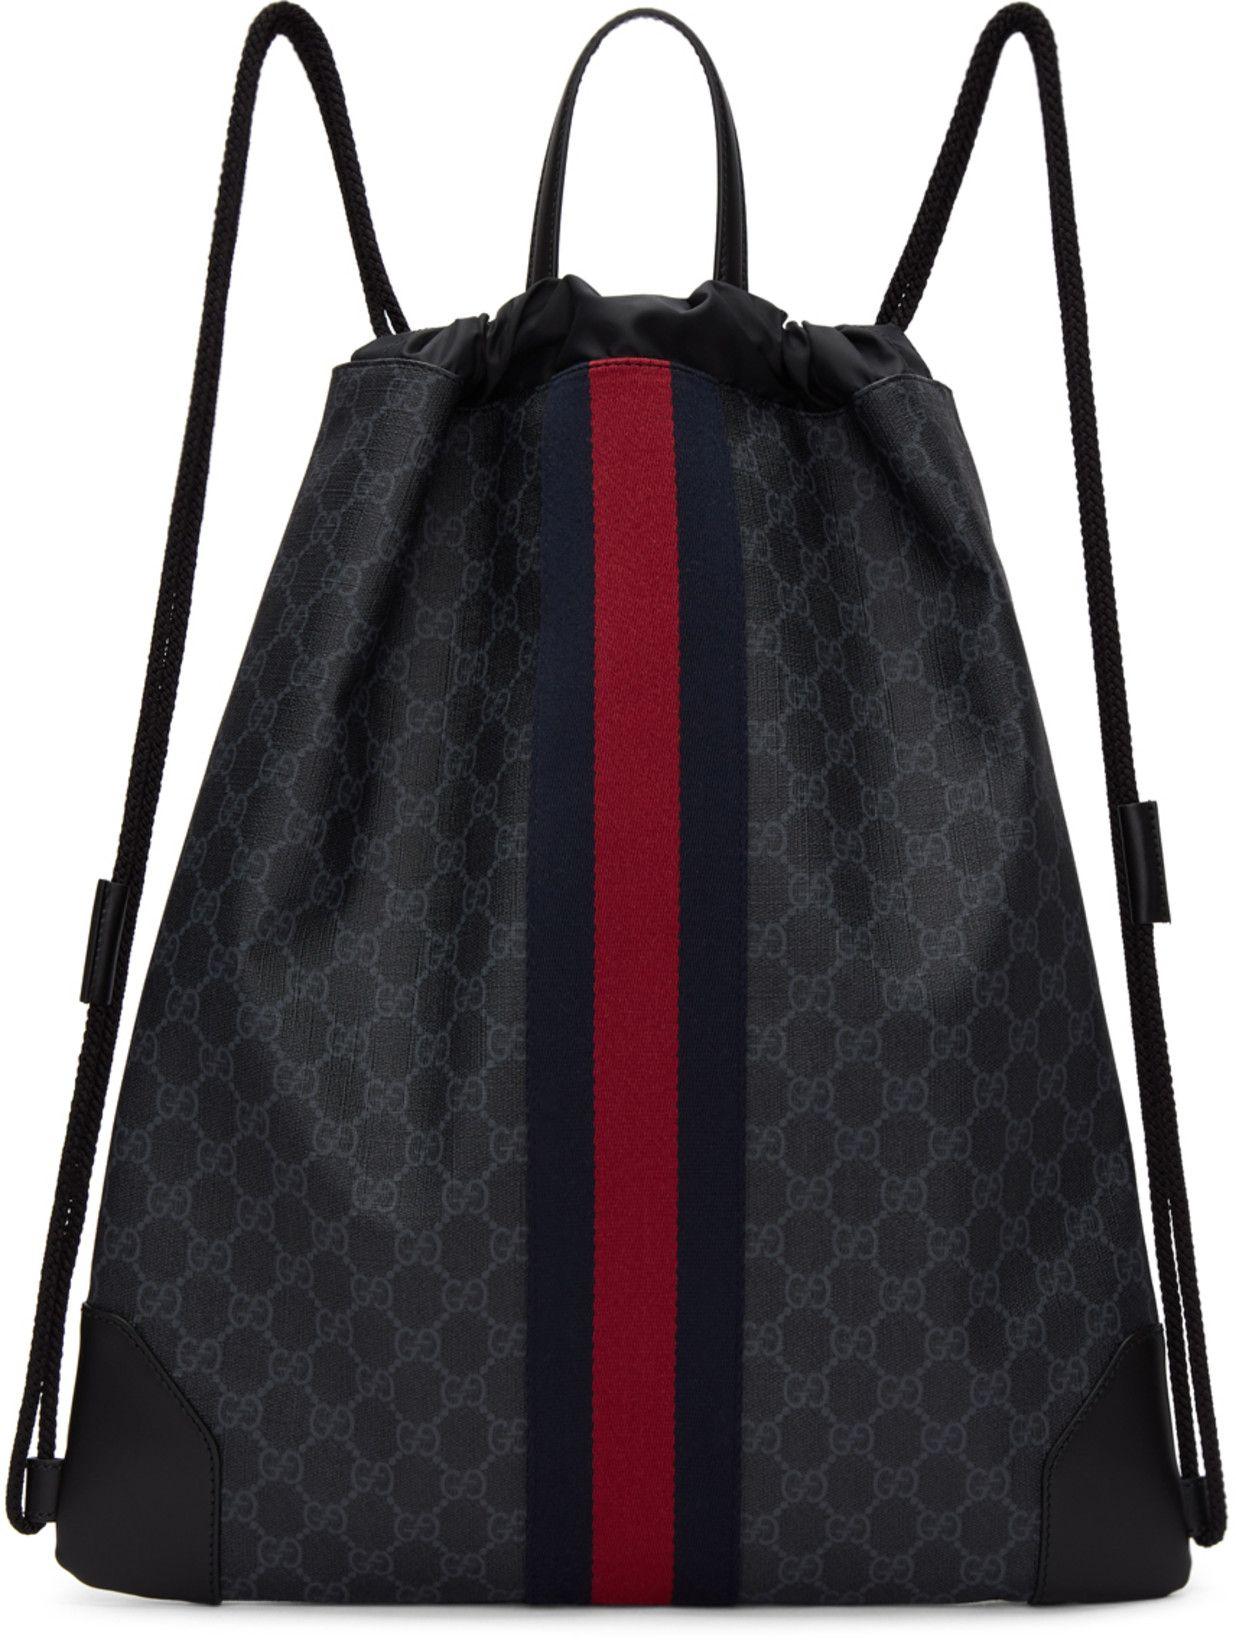 1c0ede1d190c0d Gucci - Black GG Supreme Drawstring Backpack | Bags | Bags ...